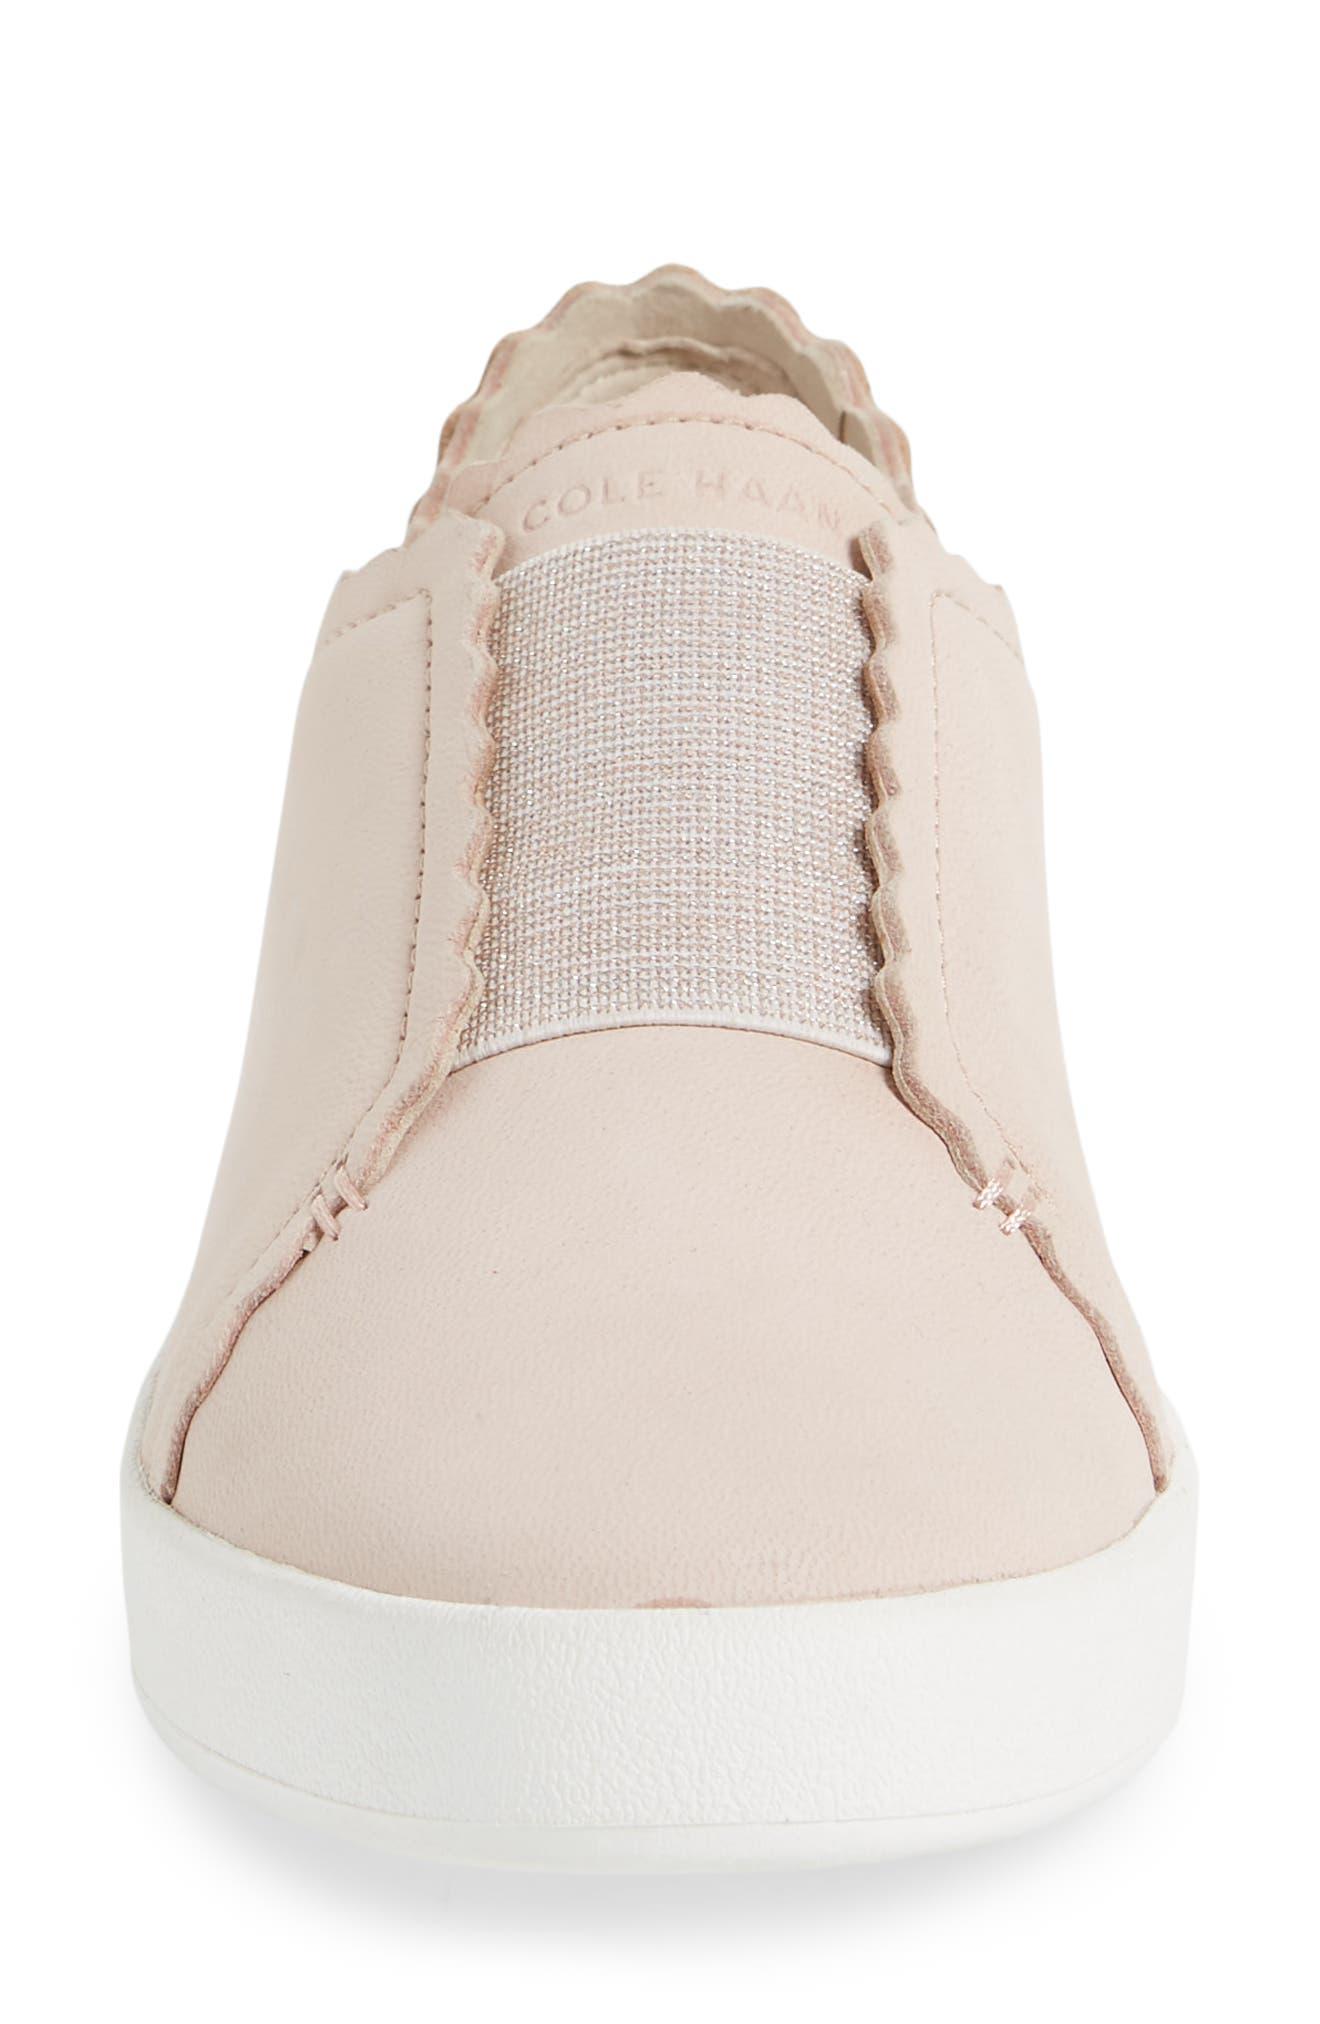 COLE HAAN, GrandPro Spectator Scalloped Slip-On Sneaker, Alternate thumbnail 4, color, PEACH BLUSH NUBUCK